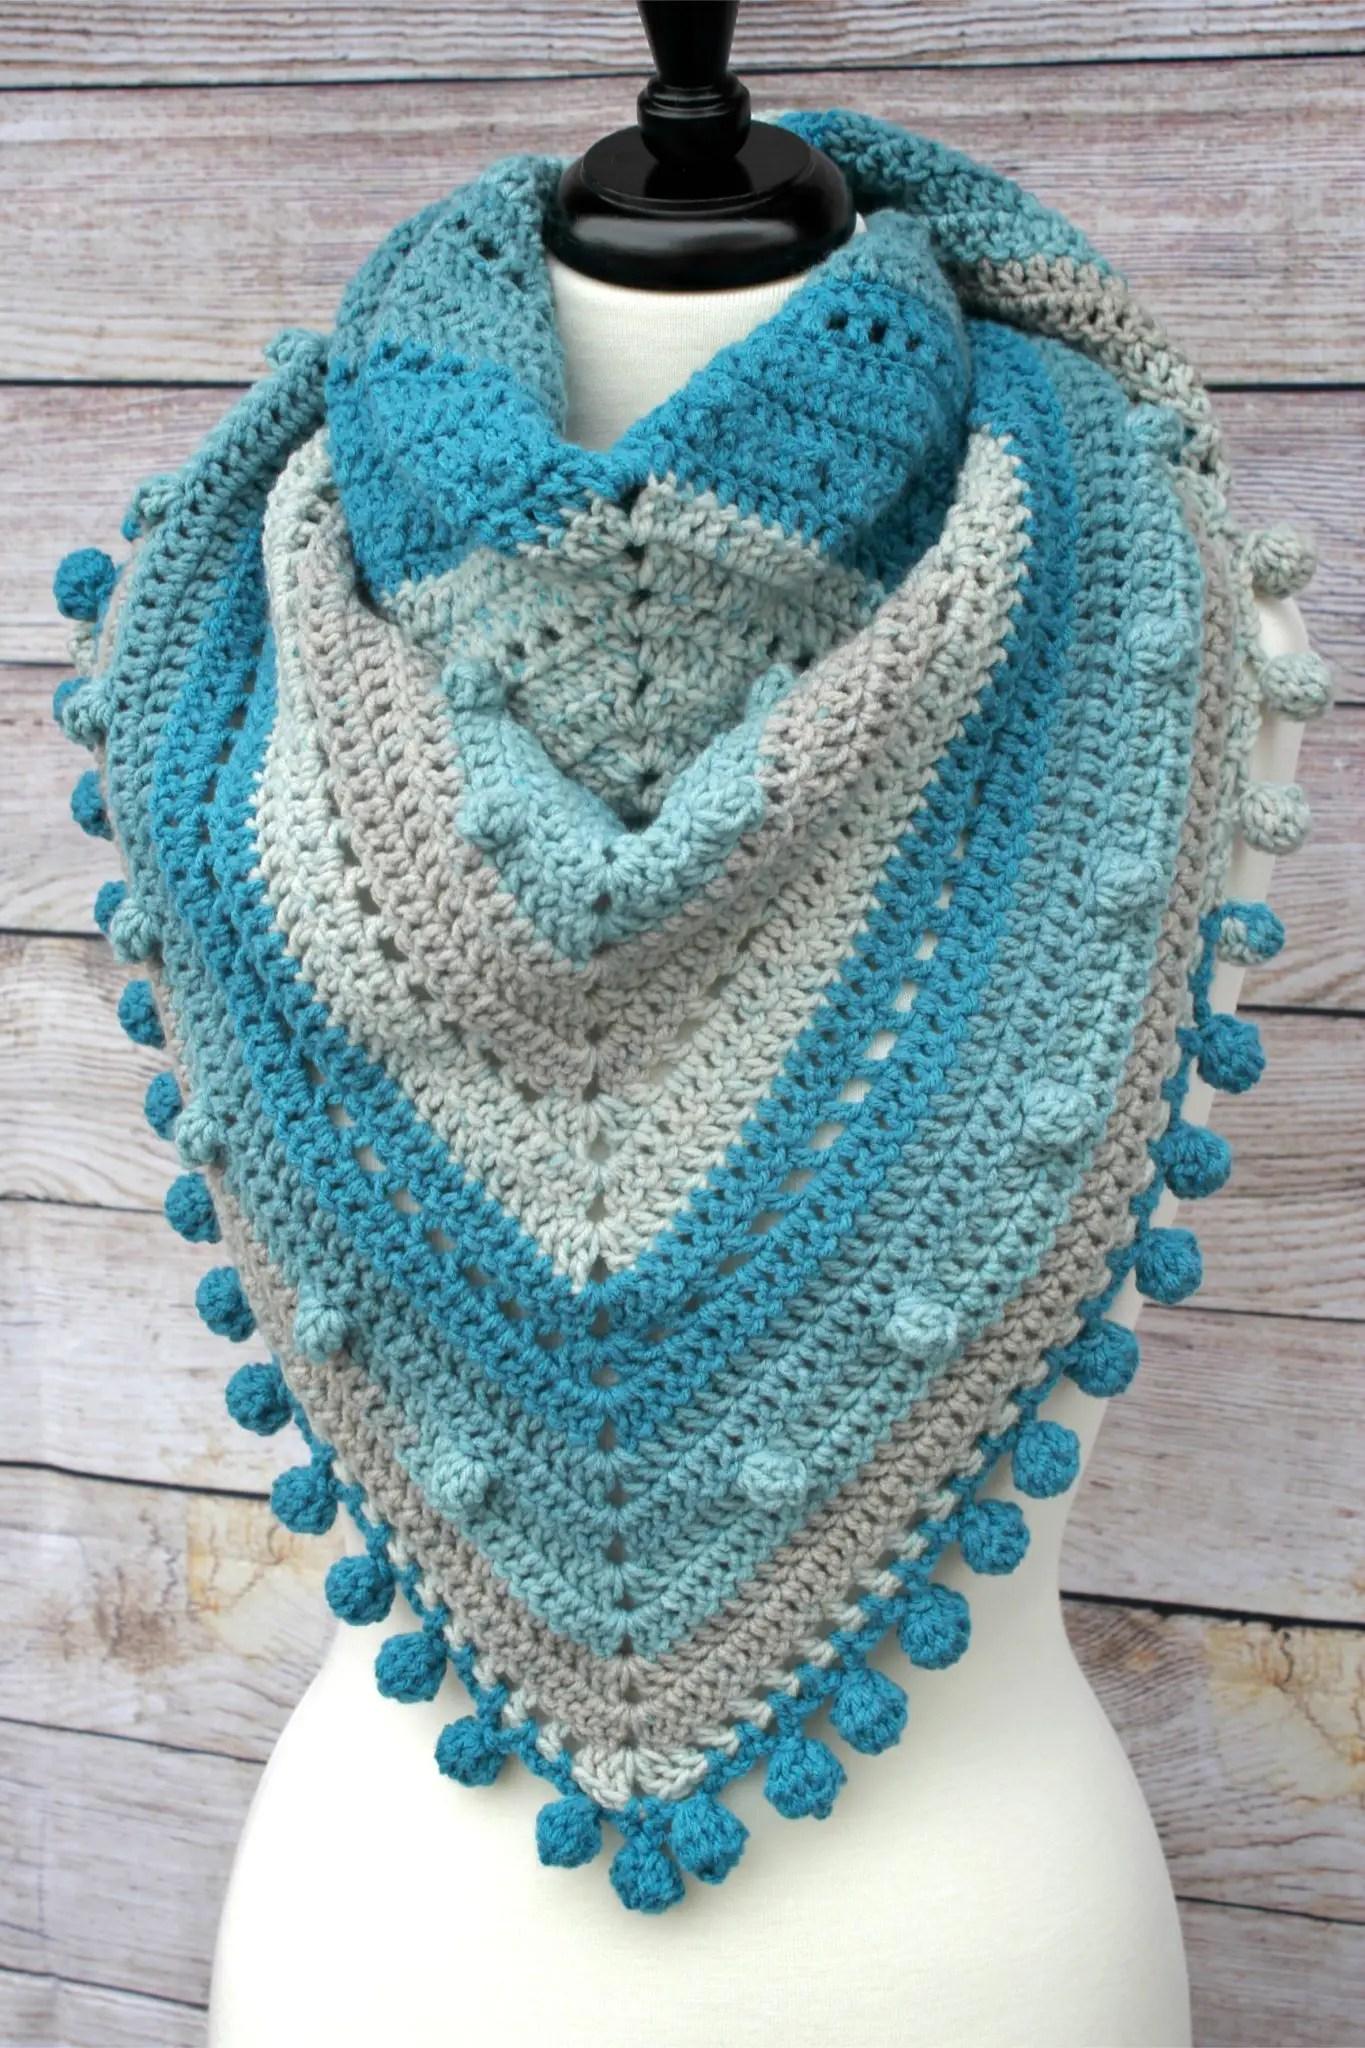 Misty Morning Triangle Scarf Shawlette Crochet Pattern Caron Big Cakes